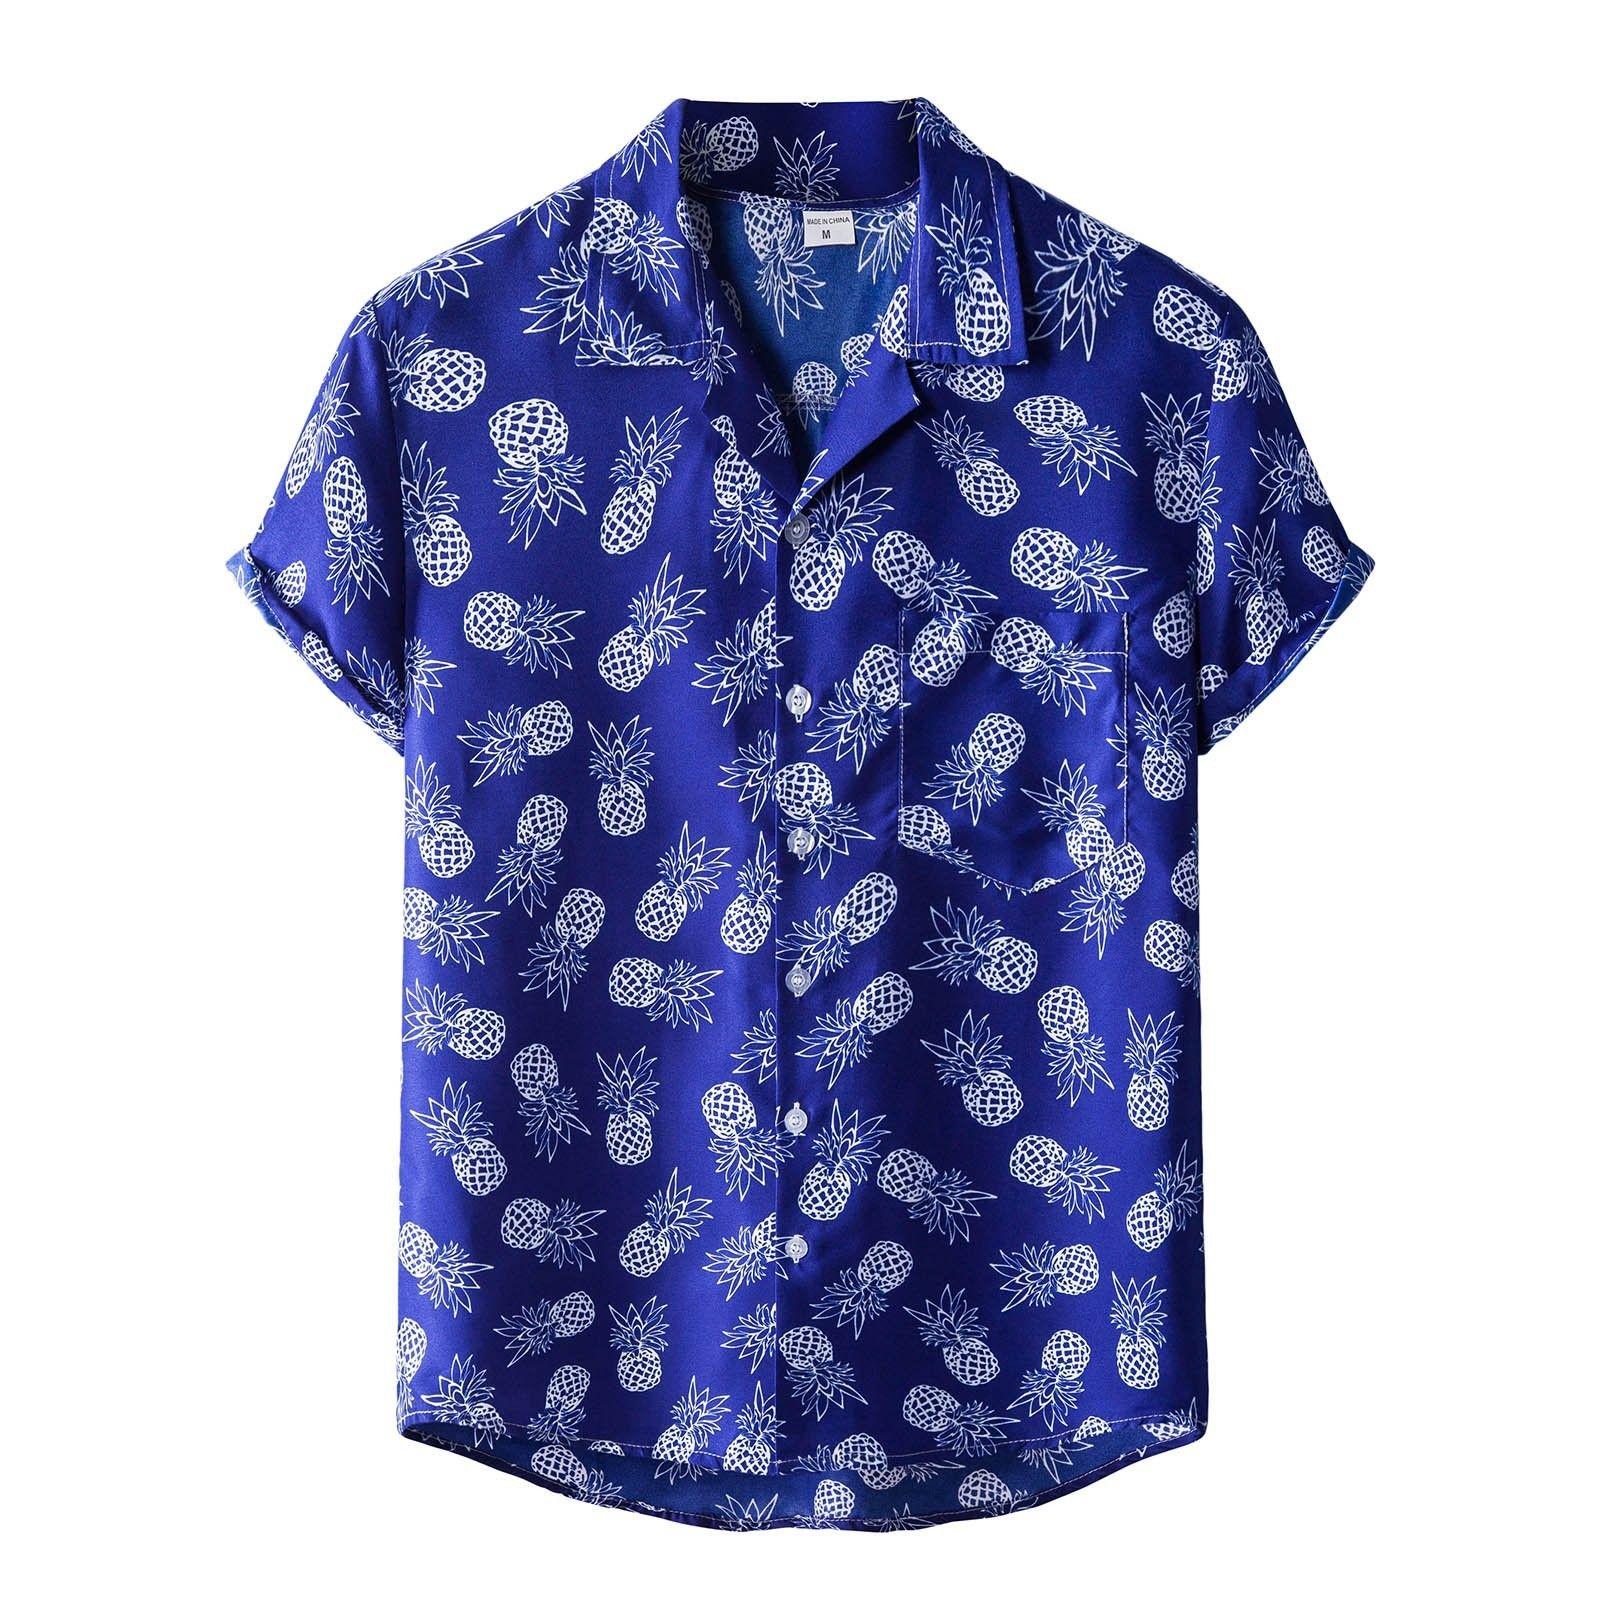 2021 Summer Hawaiian Shirt Hommes Floral Print Manches Tops Chemises à manches courtes respirantes Down Collier Mens Blouses # G30